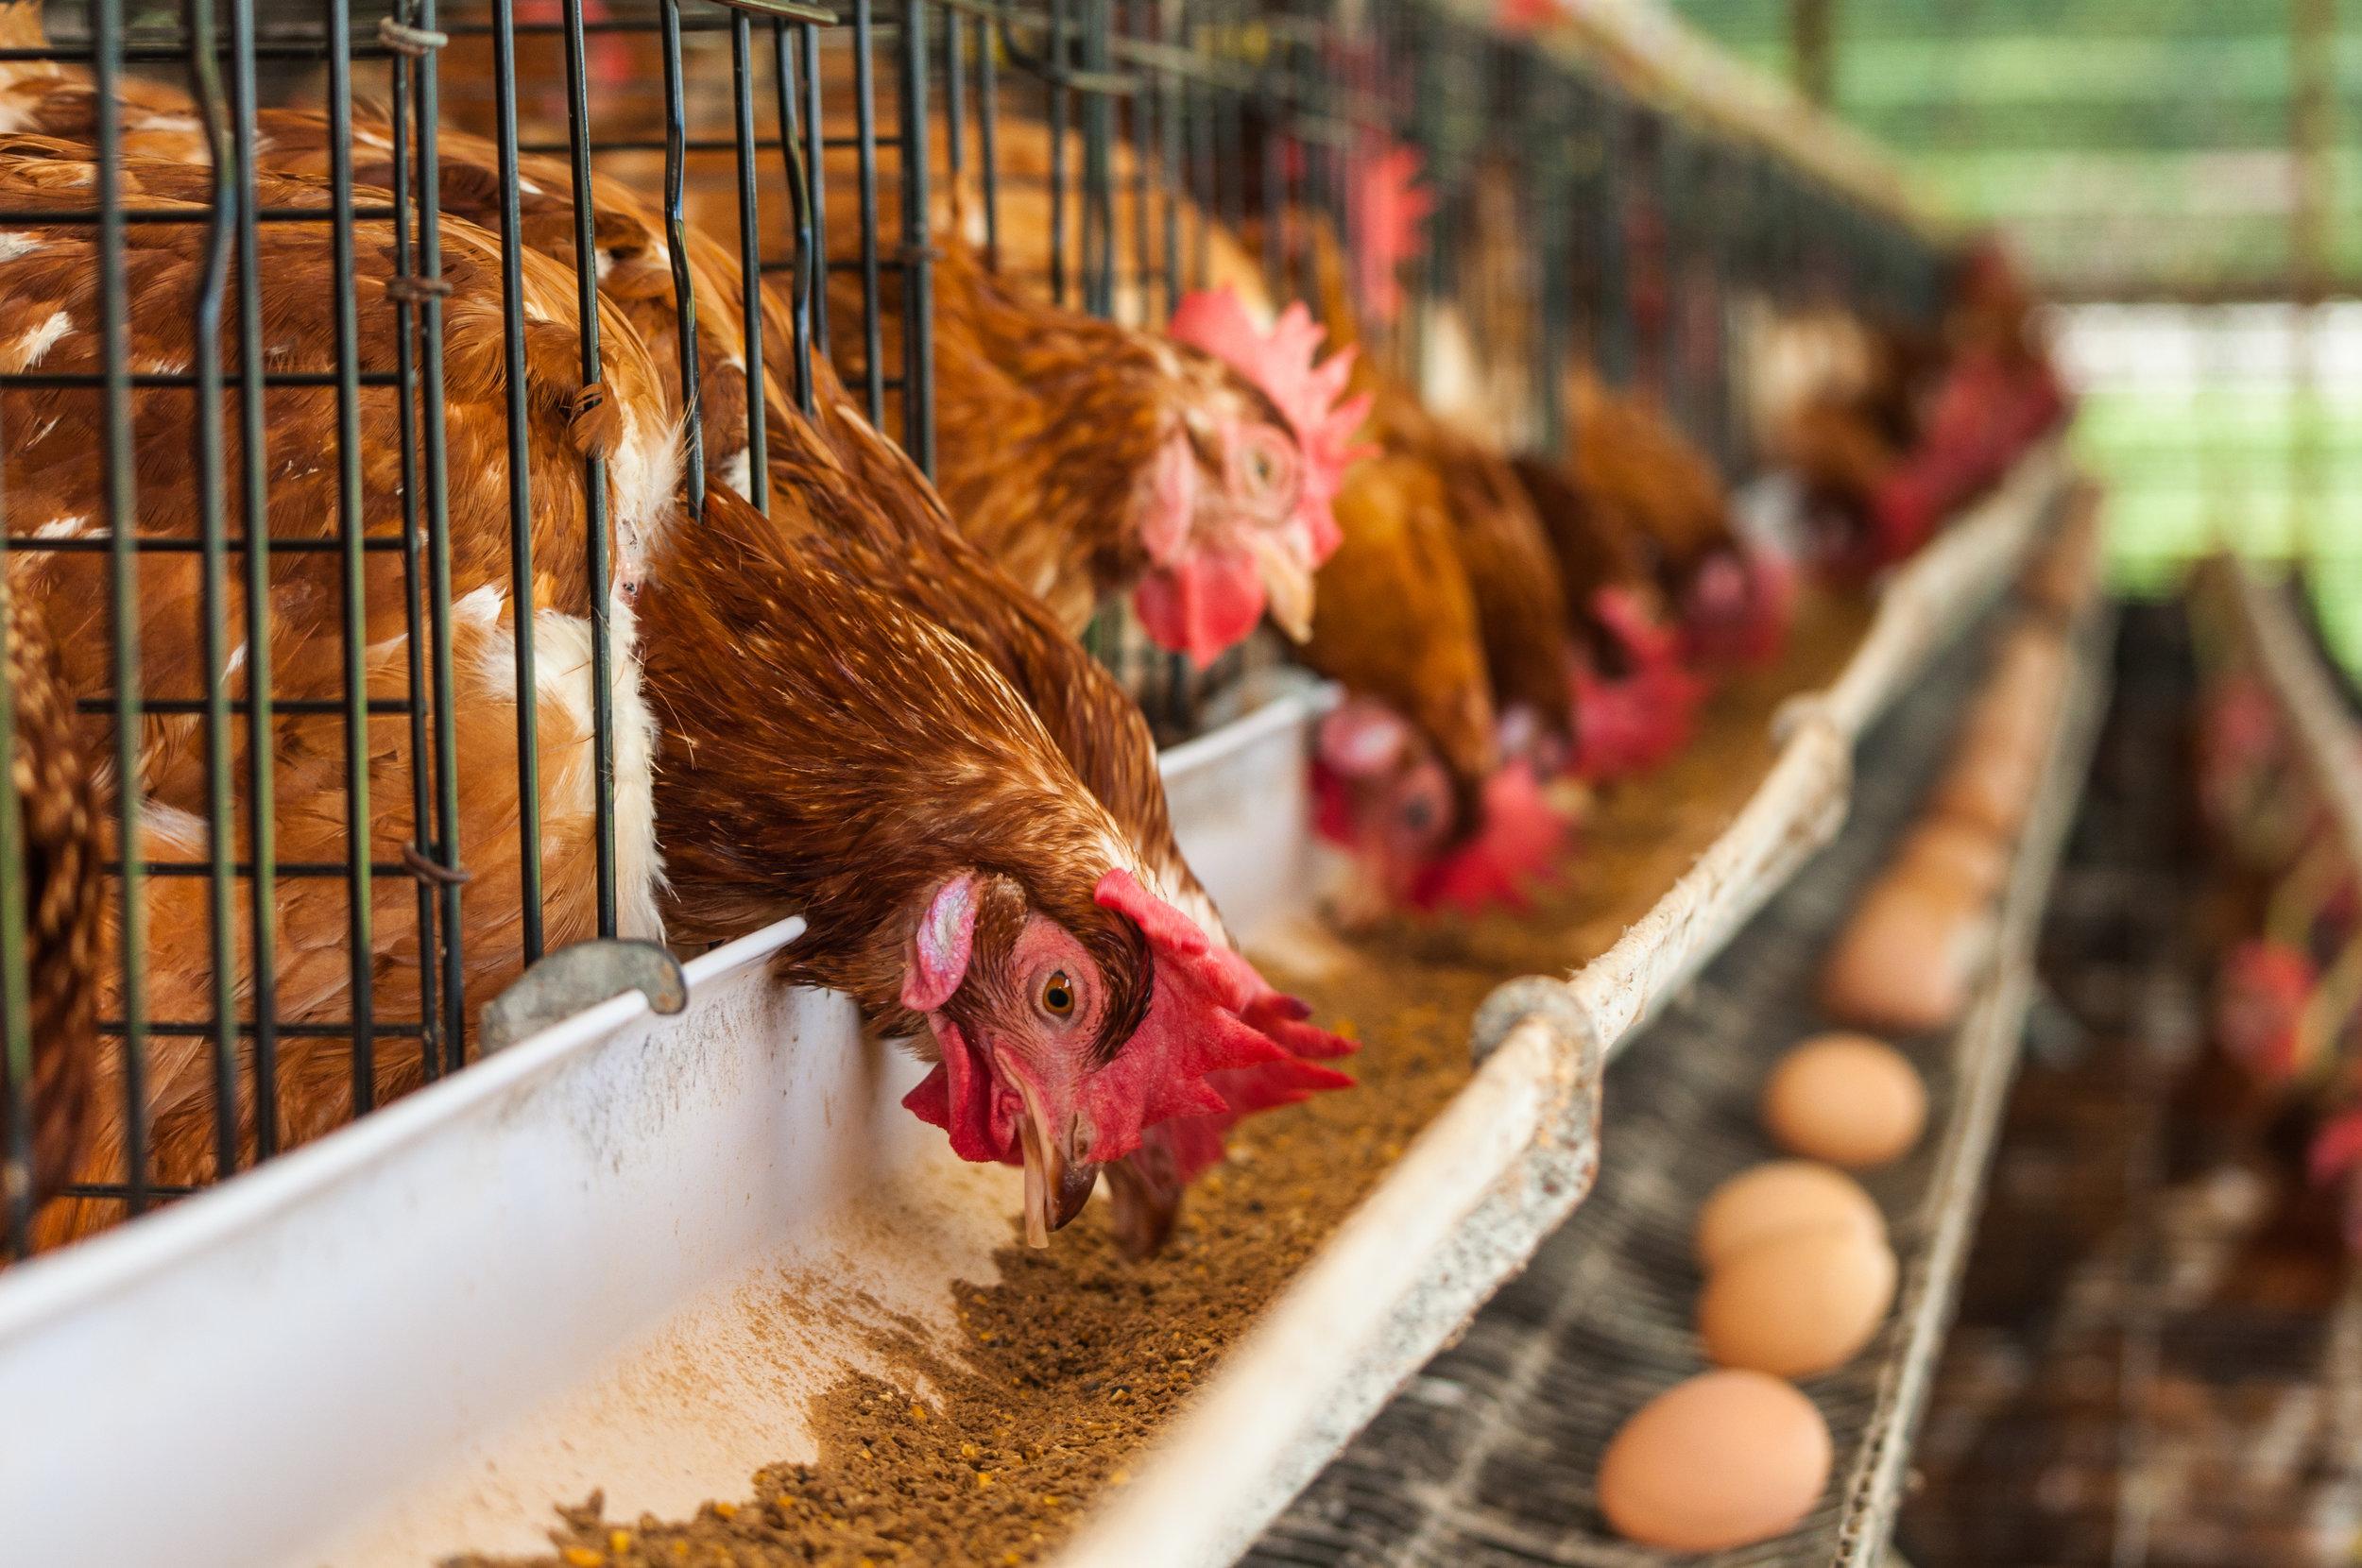 ANTIBIOTICS &FACTORY FARMS -